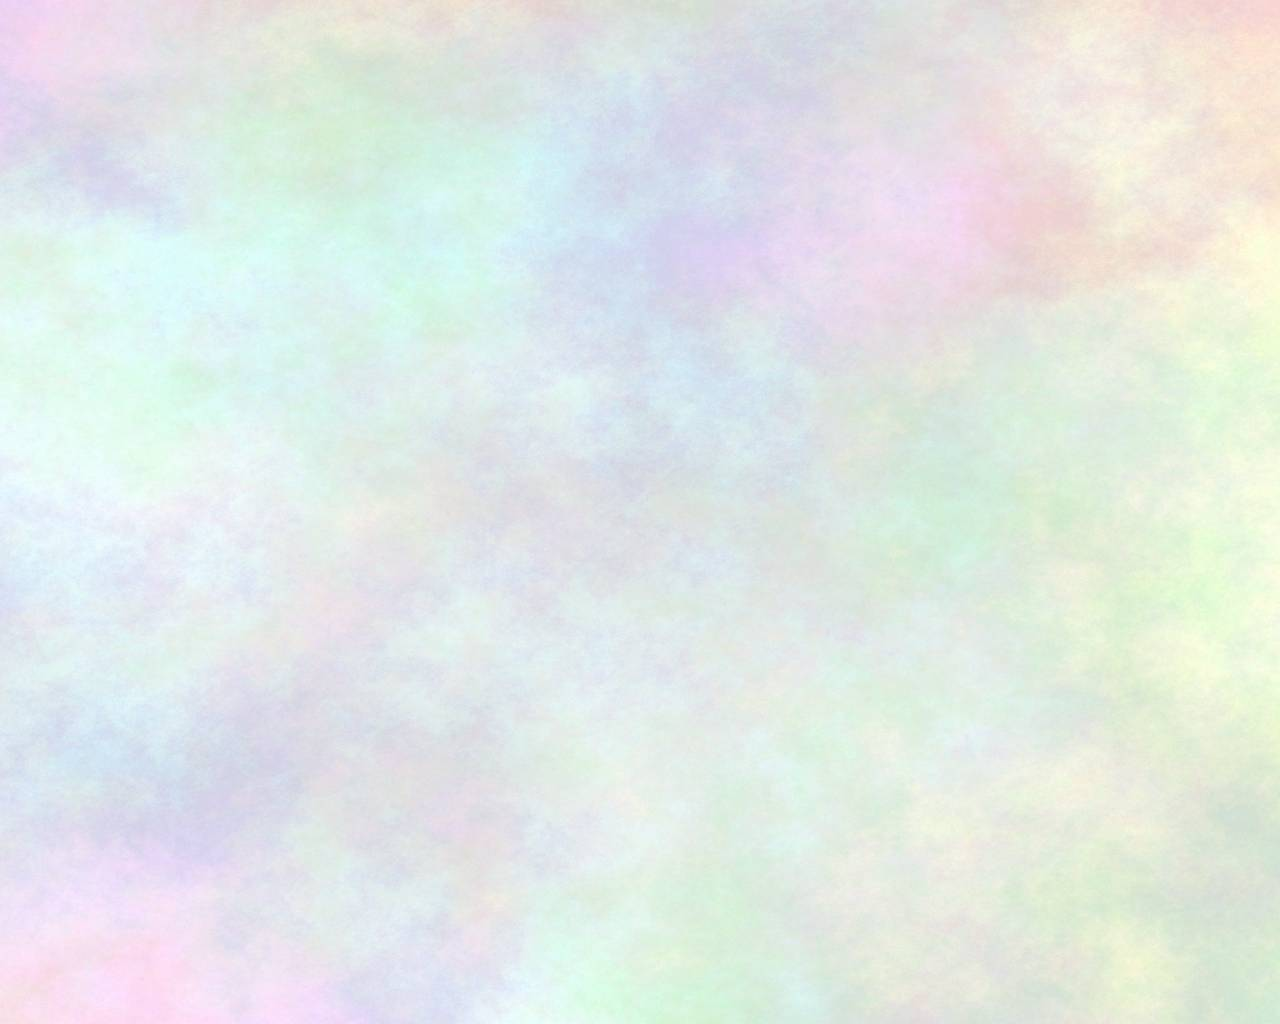 Pastel colored bows wallpaper Wallpaper Wide HD 1280x1024